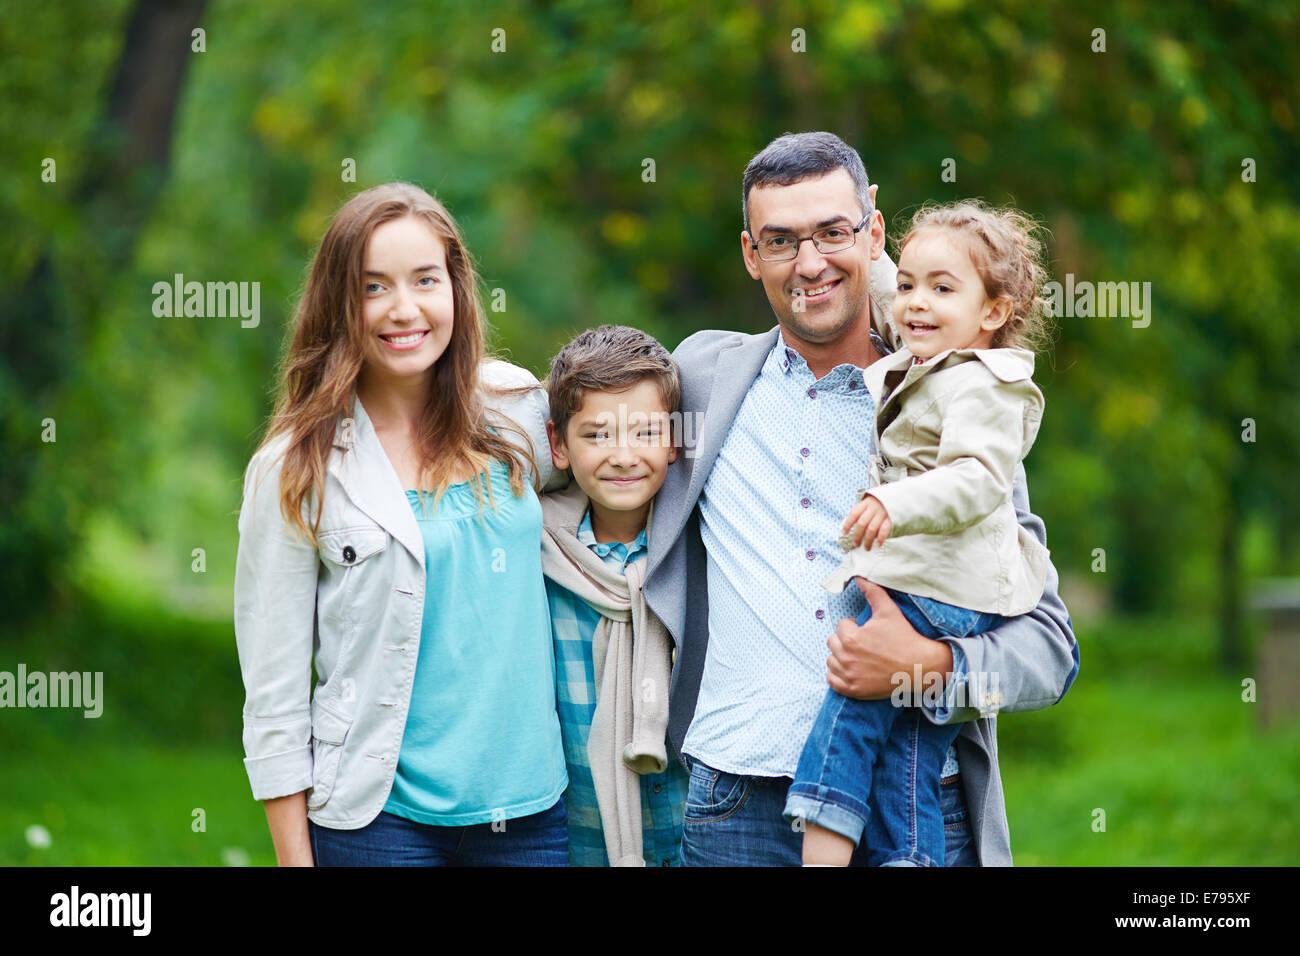 Happy family members looking at camera in natural environment Stock Photo